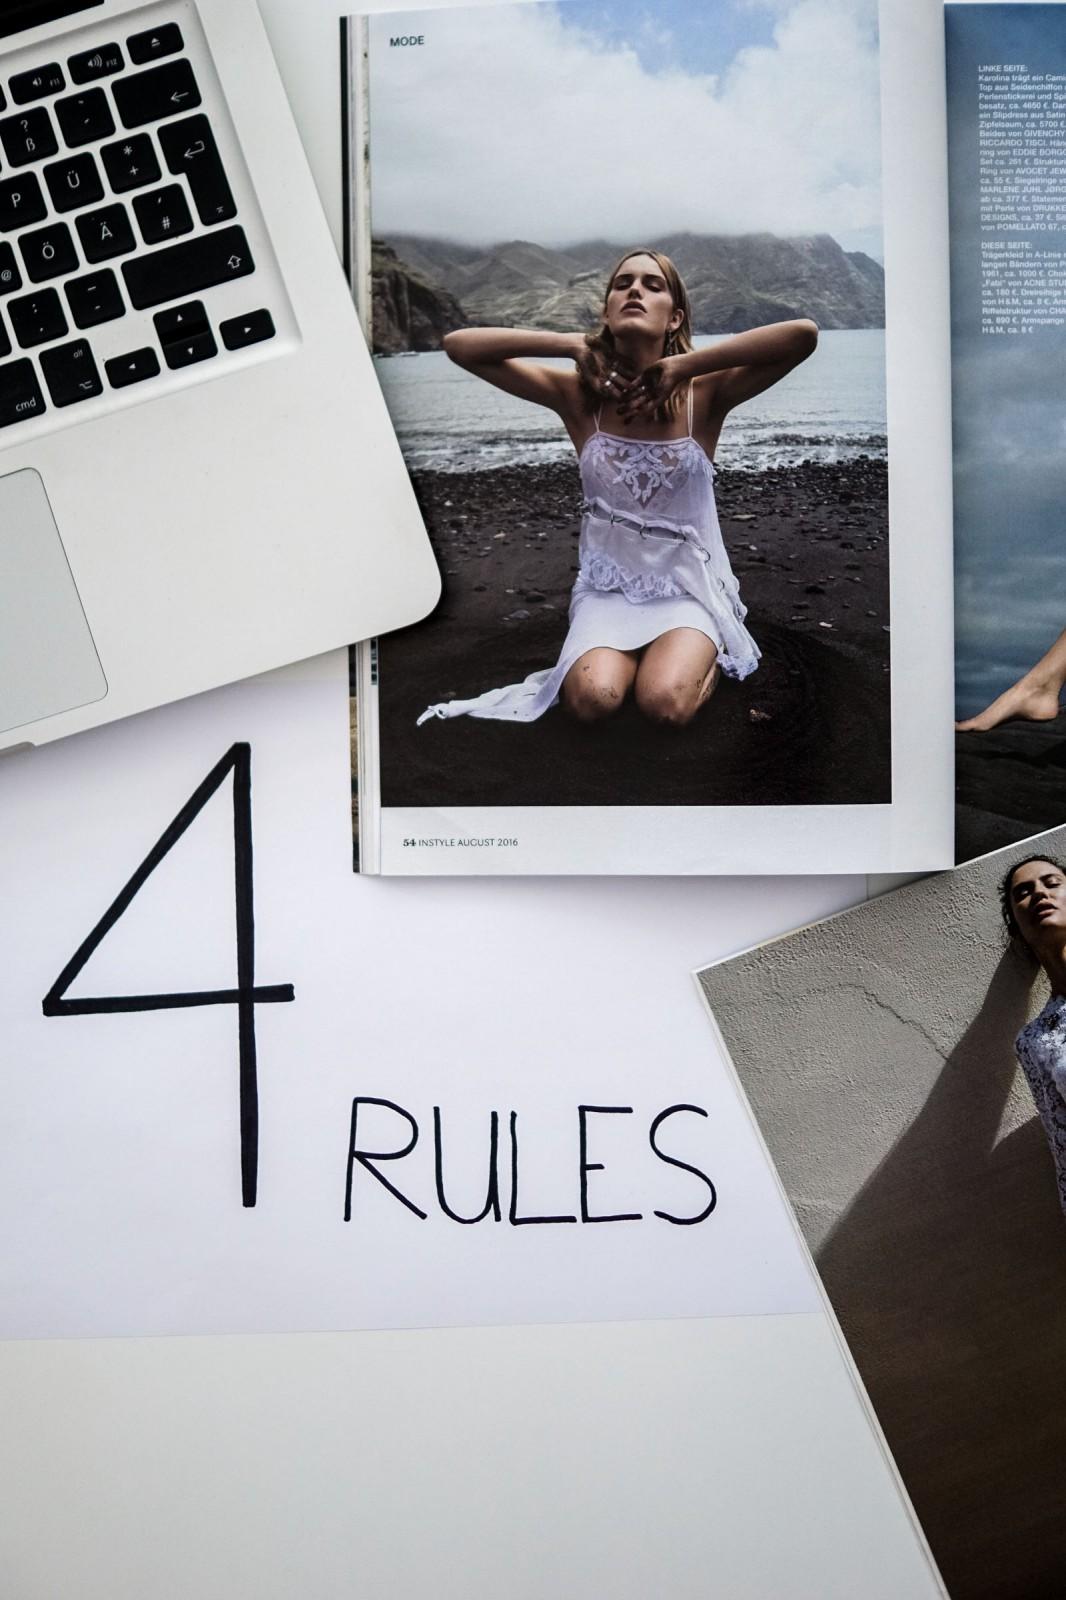 4_Rules-1